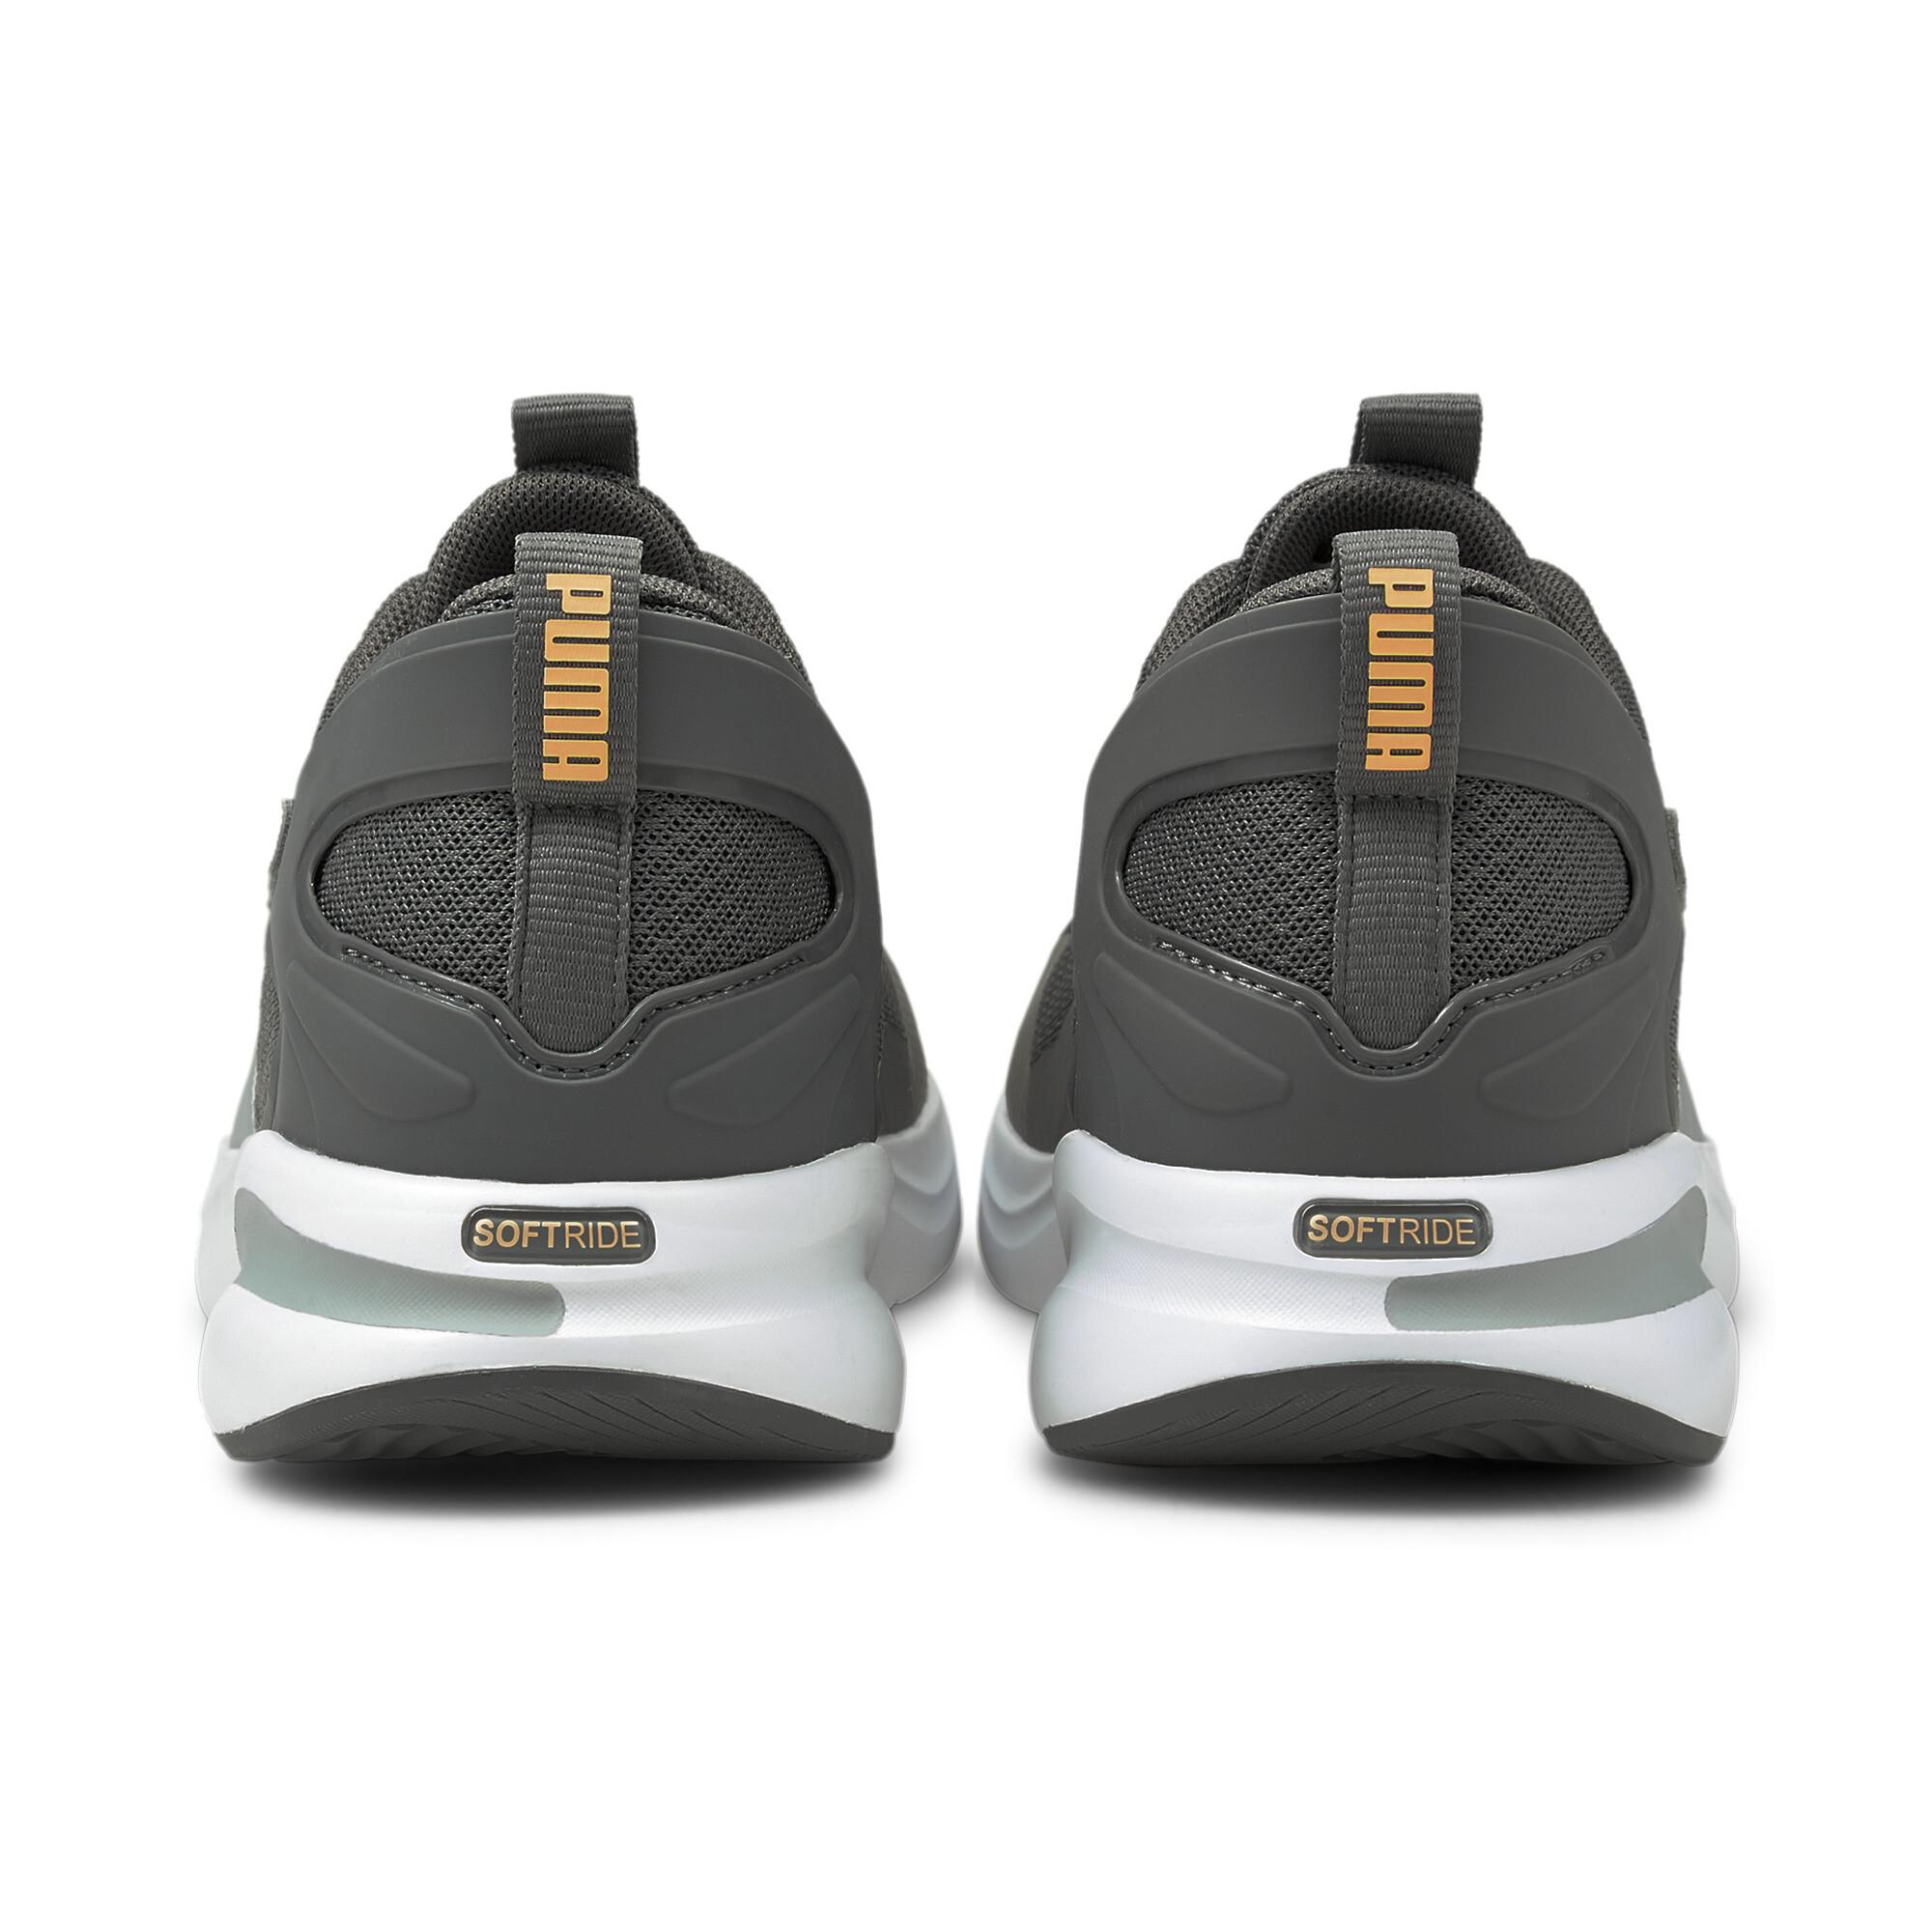 thumbnail 7 - PUMA Men's SoftRide Rift Running Shoes